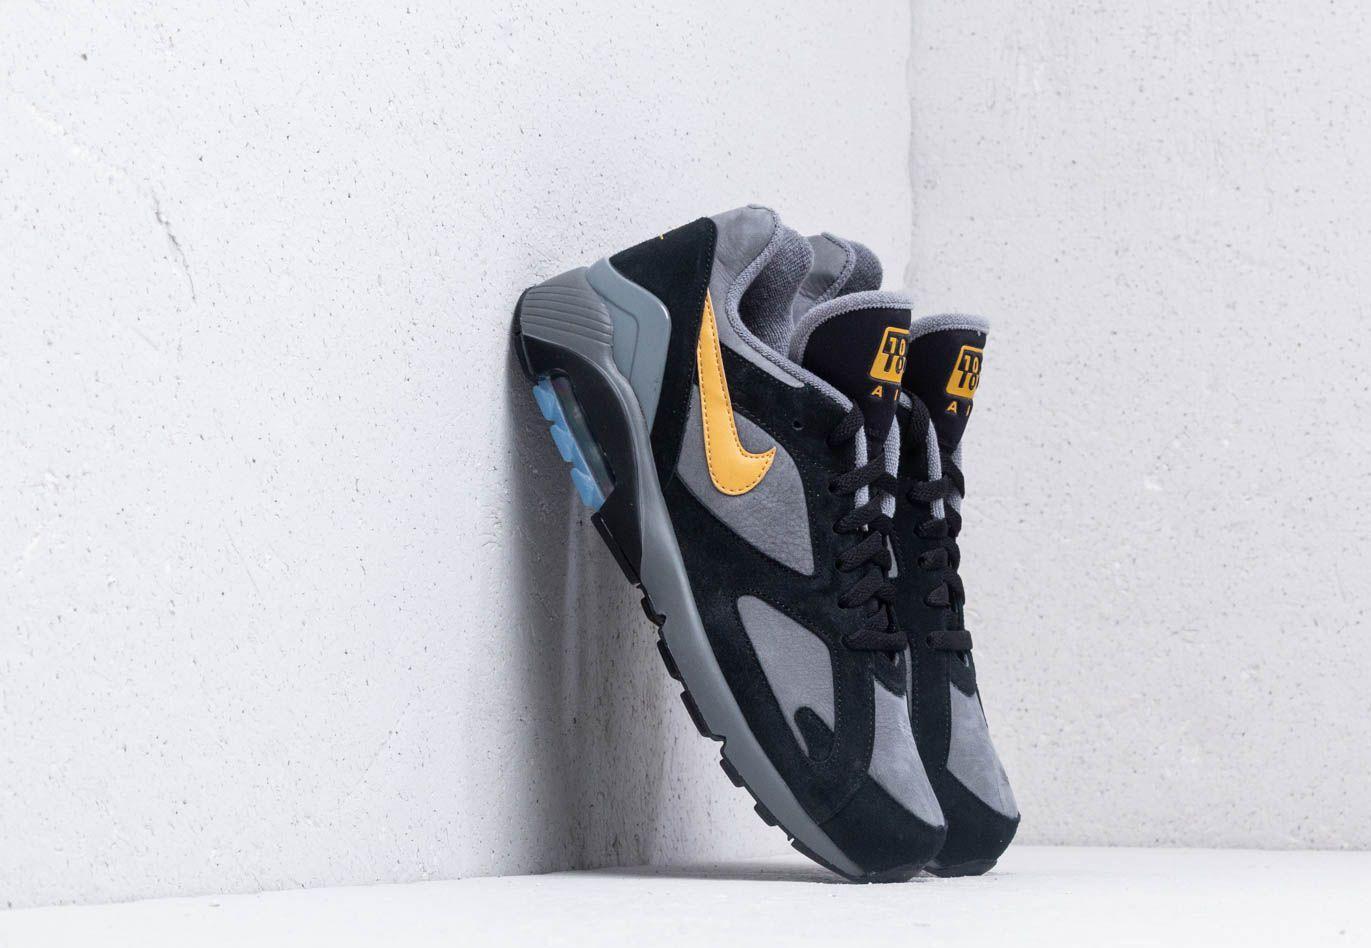 571f1bd954ba Nike - Gray Air Max 180 Cool Grey  Wheat Gold-black for Men -. View  fullscreen